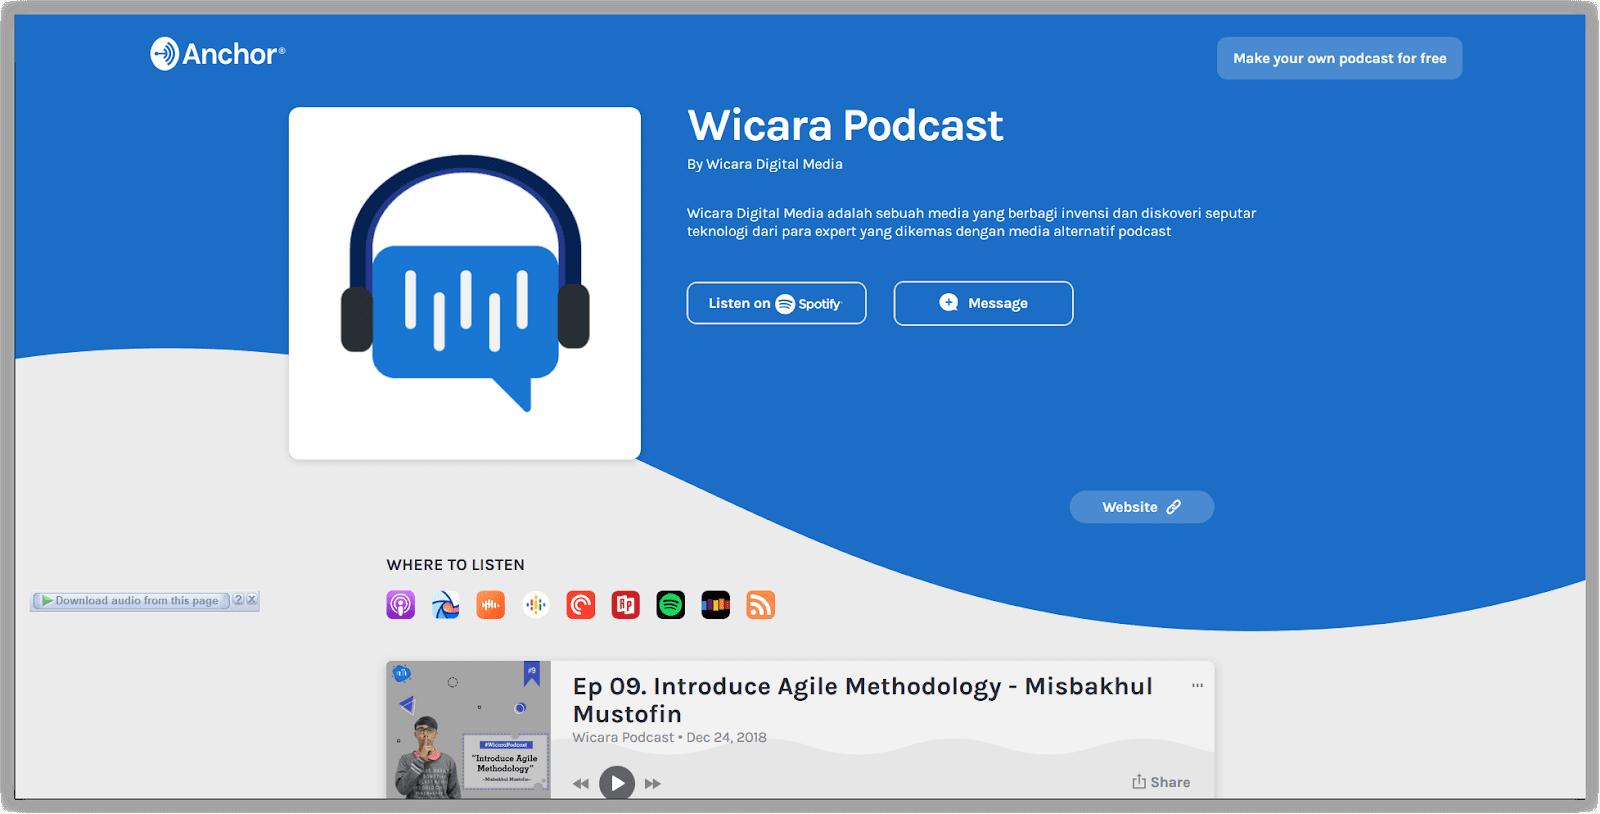 Contoh channel podcast yang menjadi sarana mendapatkan penghasilan online.